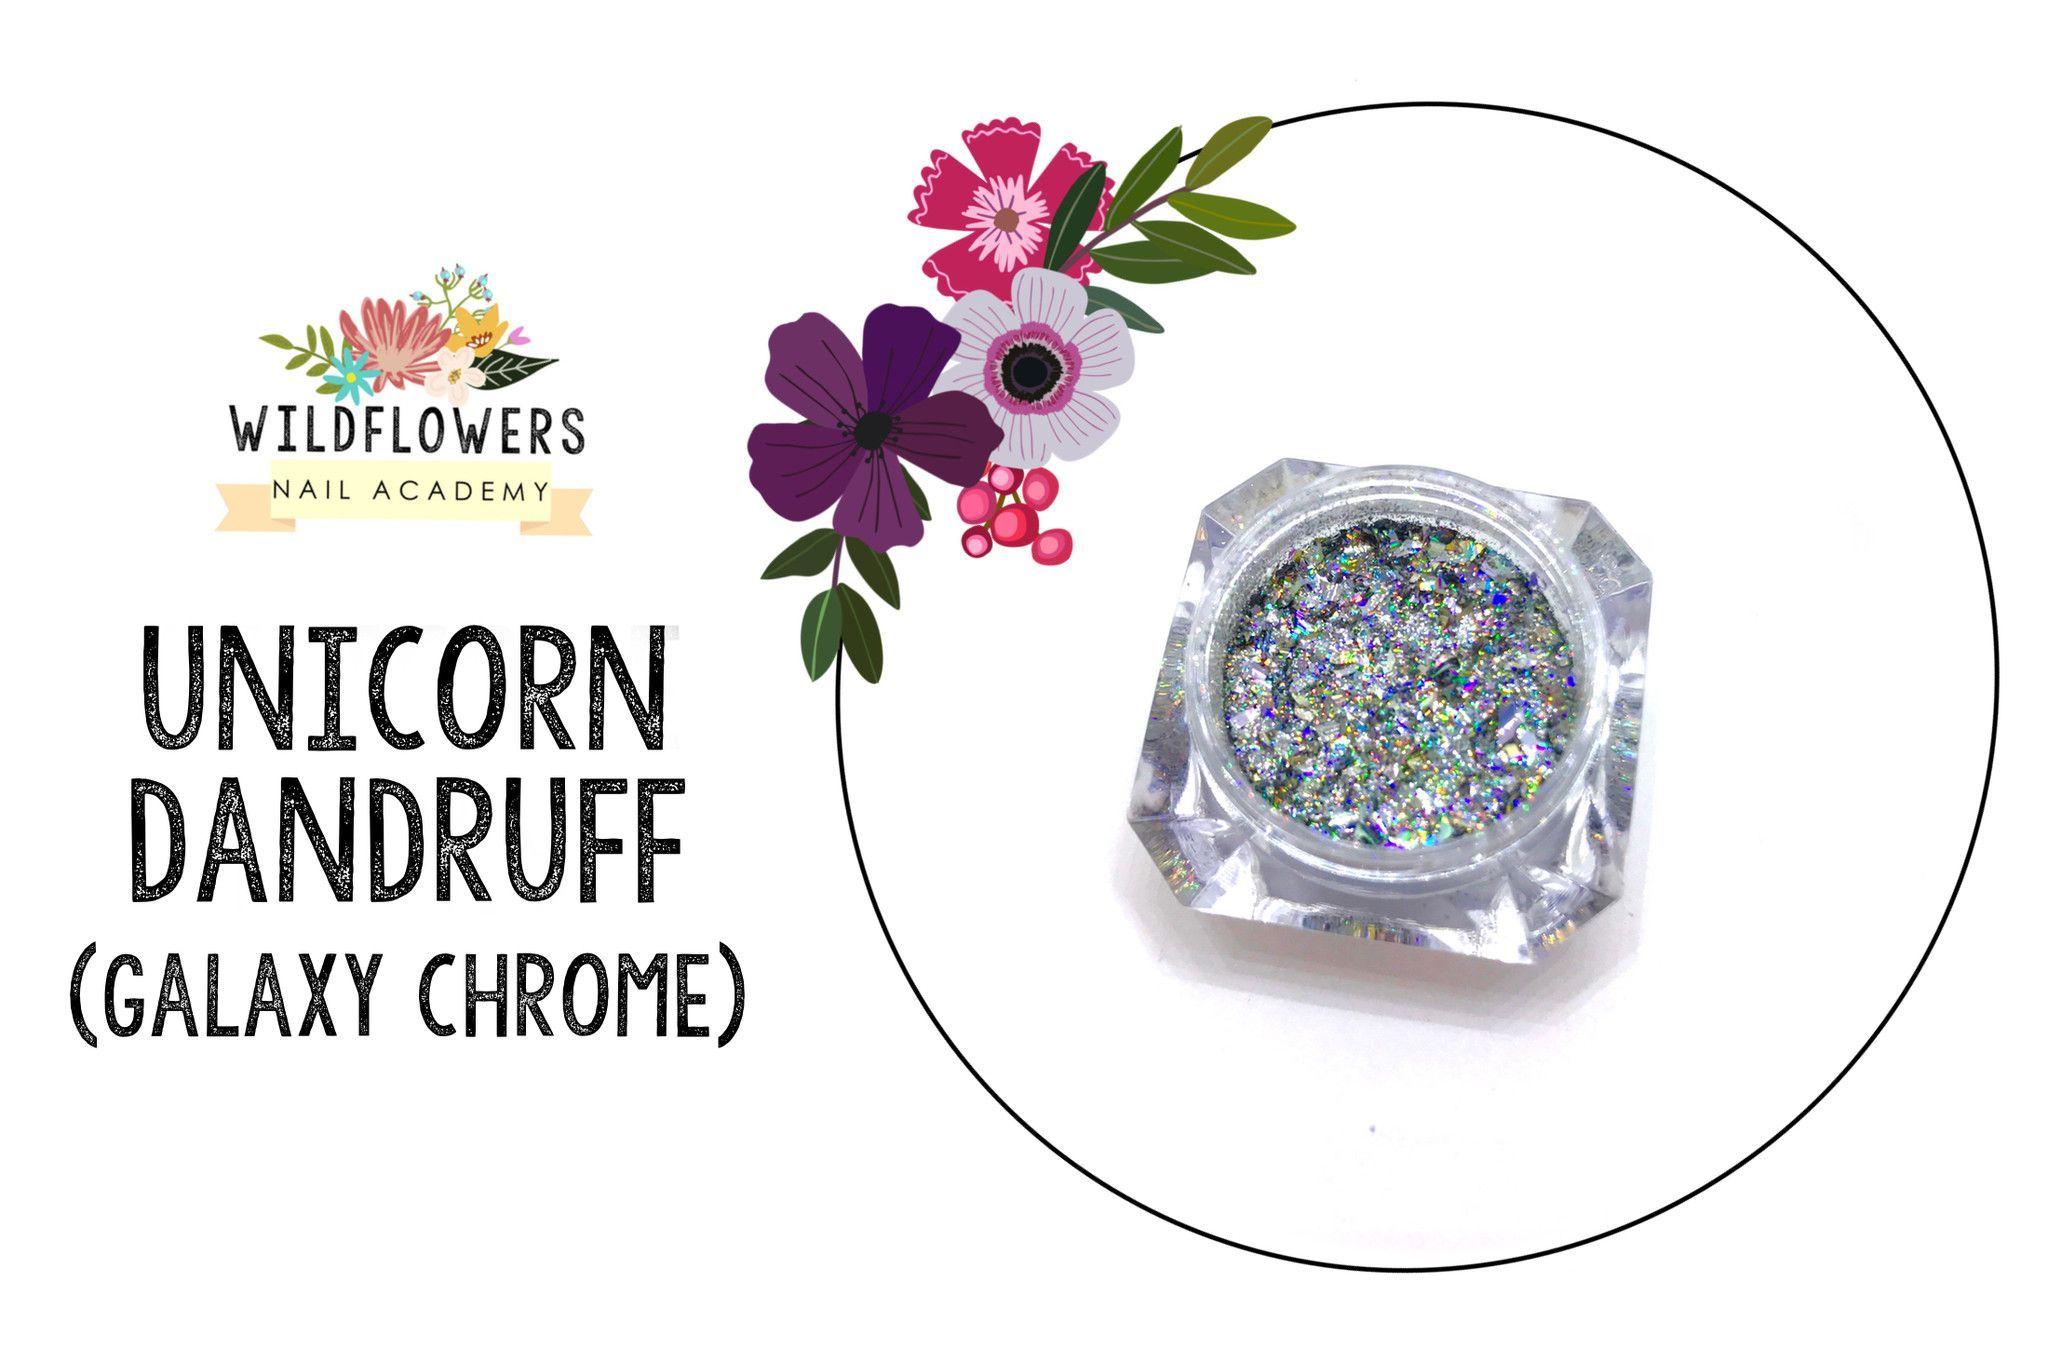 Unicorn Dandruff (Galaxy Chrome)